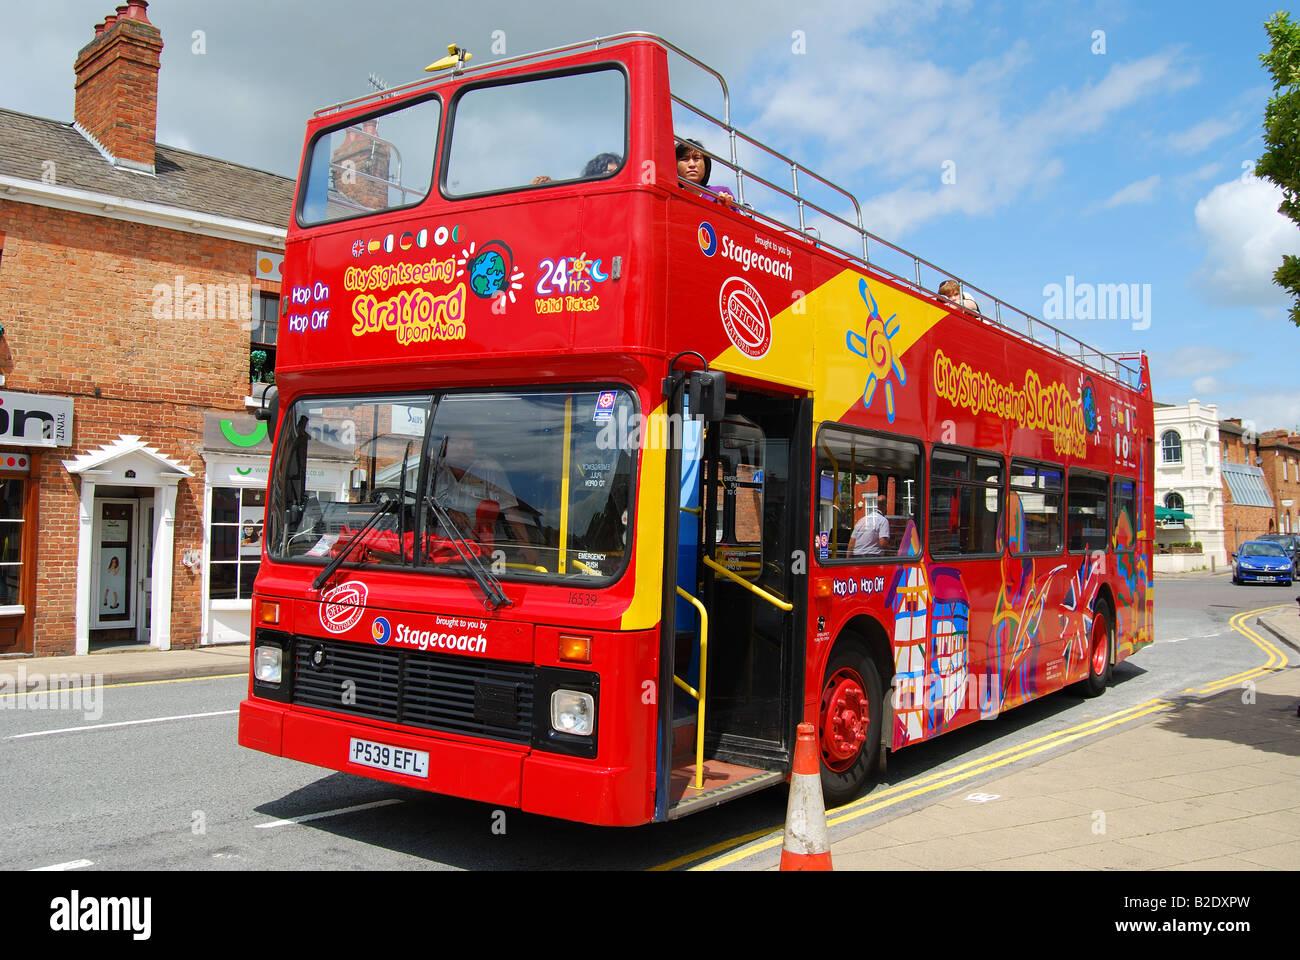 Tourist Sightseeing Bus Windsor Street Stratford Upon Avon Warwickshire England